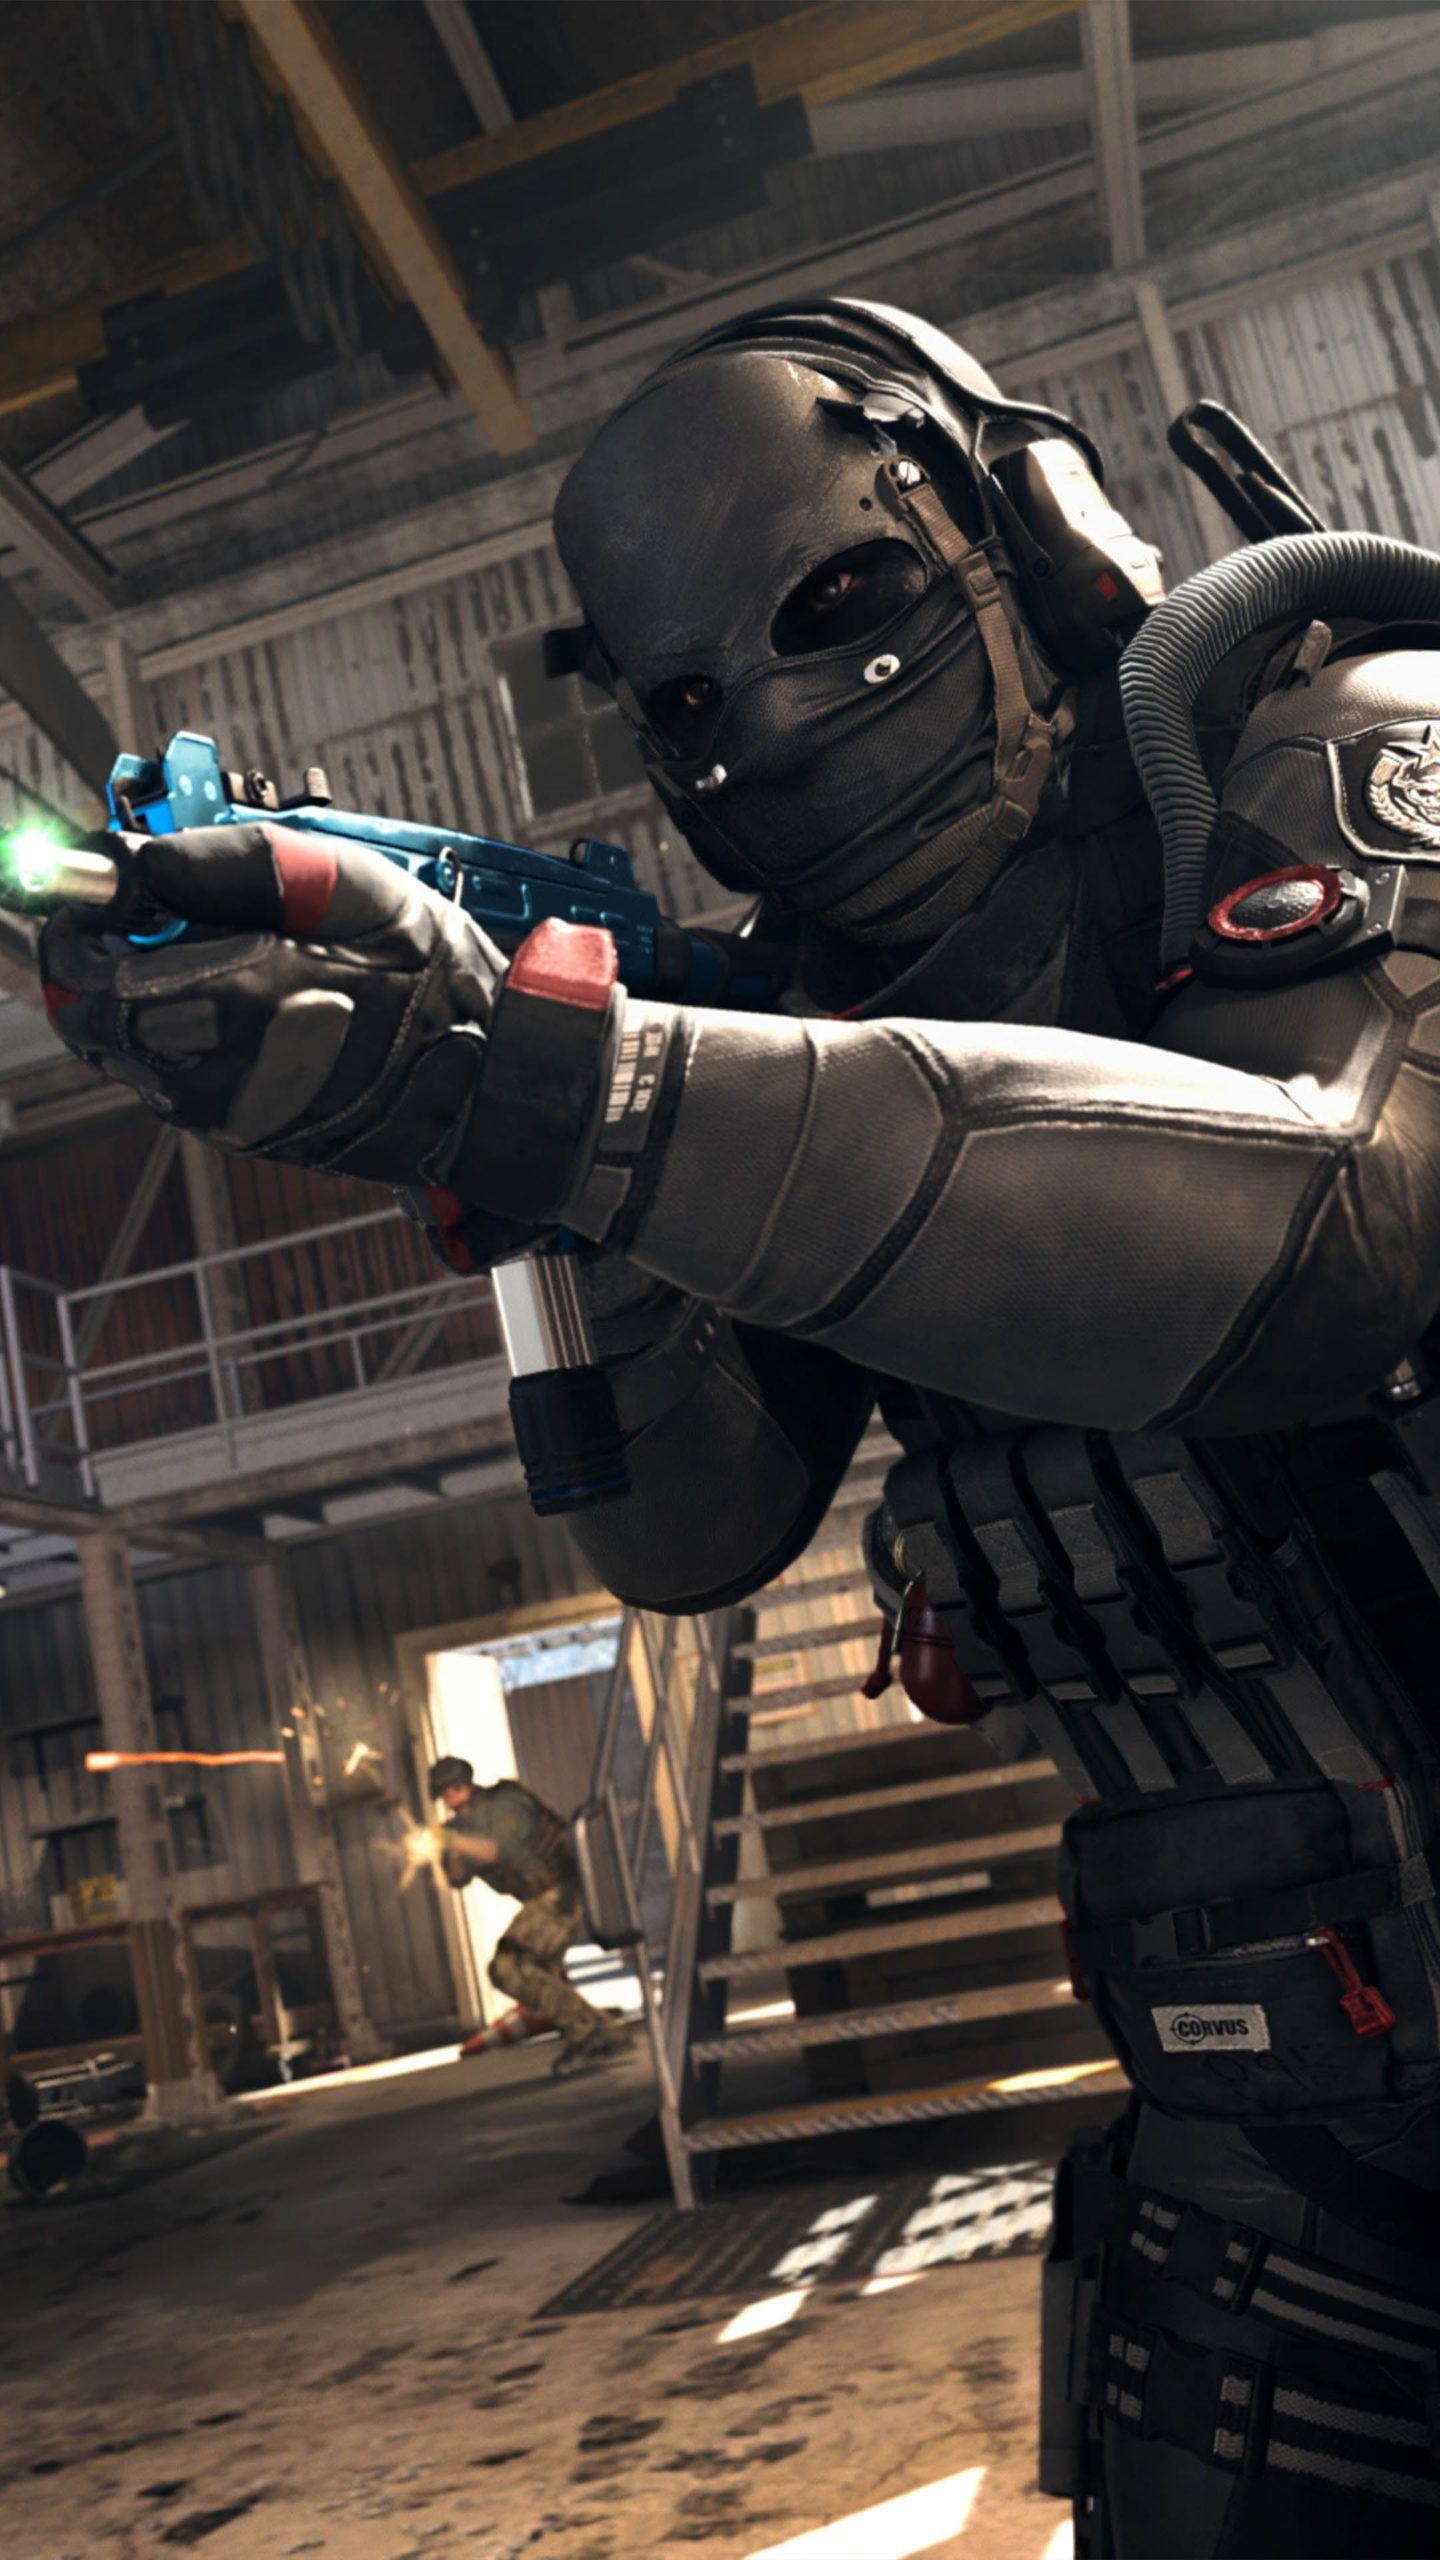 Maskman Call Of Duty Modern Warfare 2020 4k Ultra Hd Mobile Wallpaper In 2020 Modern Warfare Call Of Duty Call Of Duty Ghosts